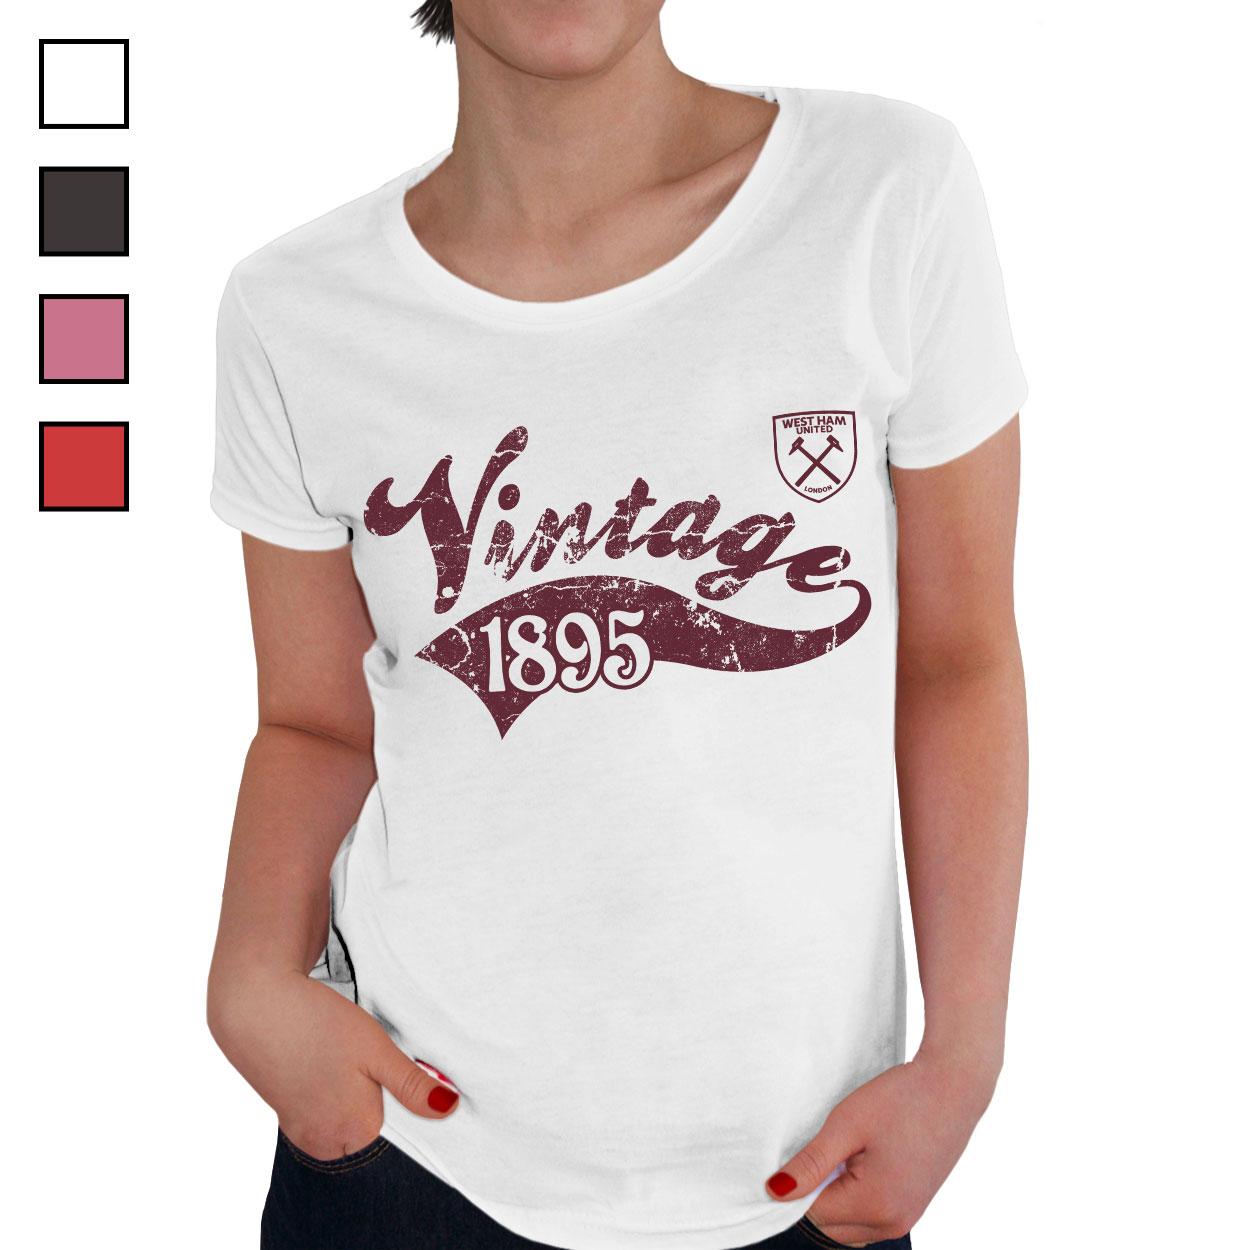 West Ham United FC Ladies Vintage T-Shirt